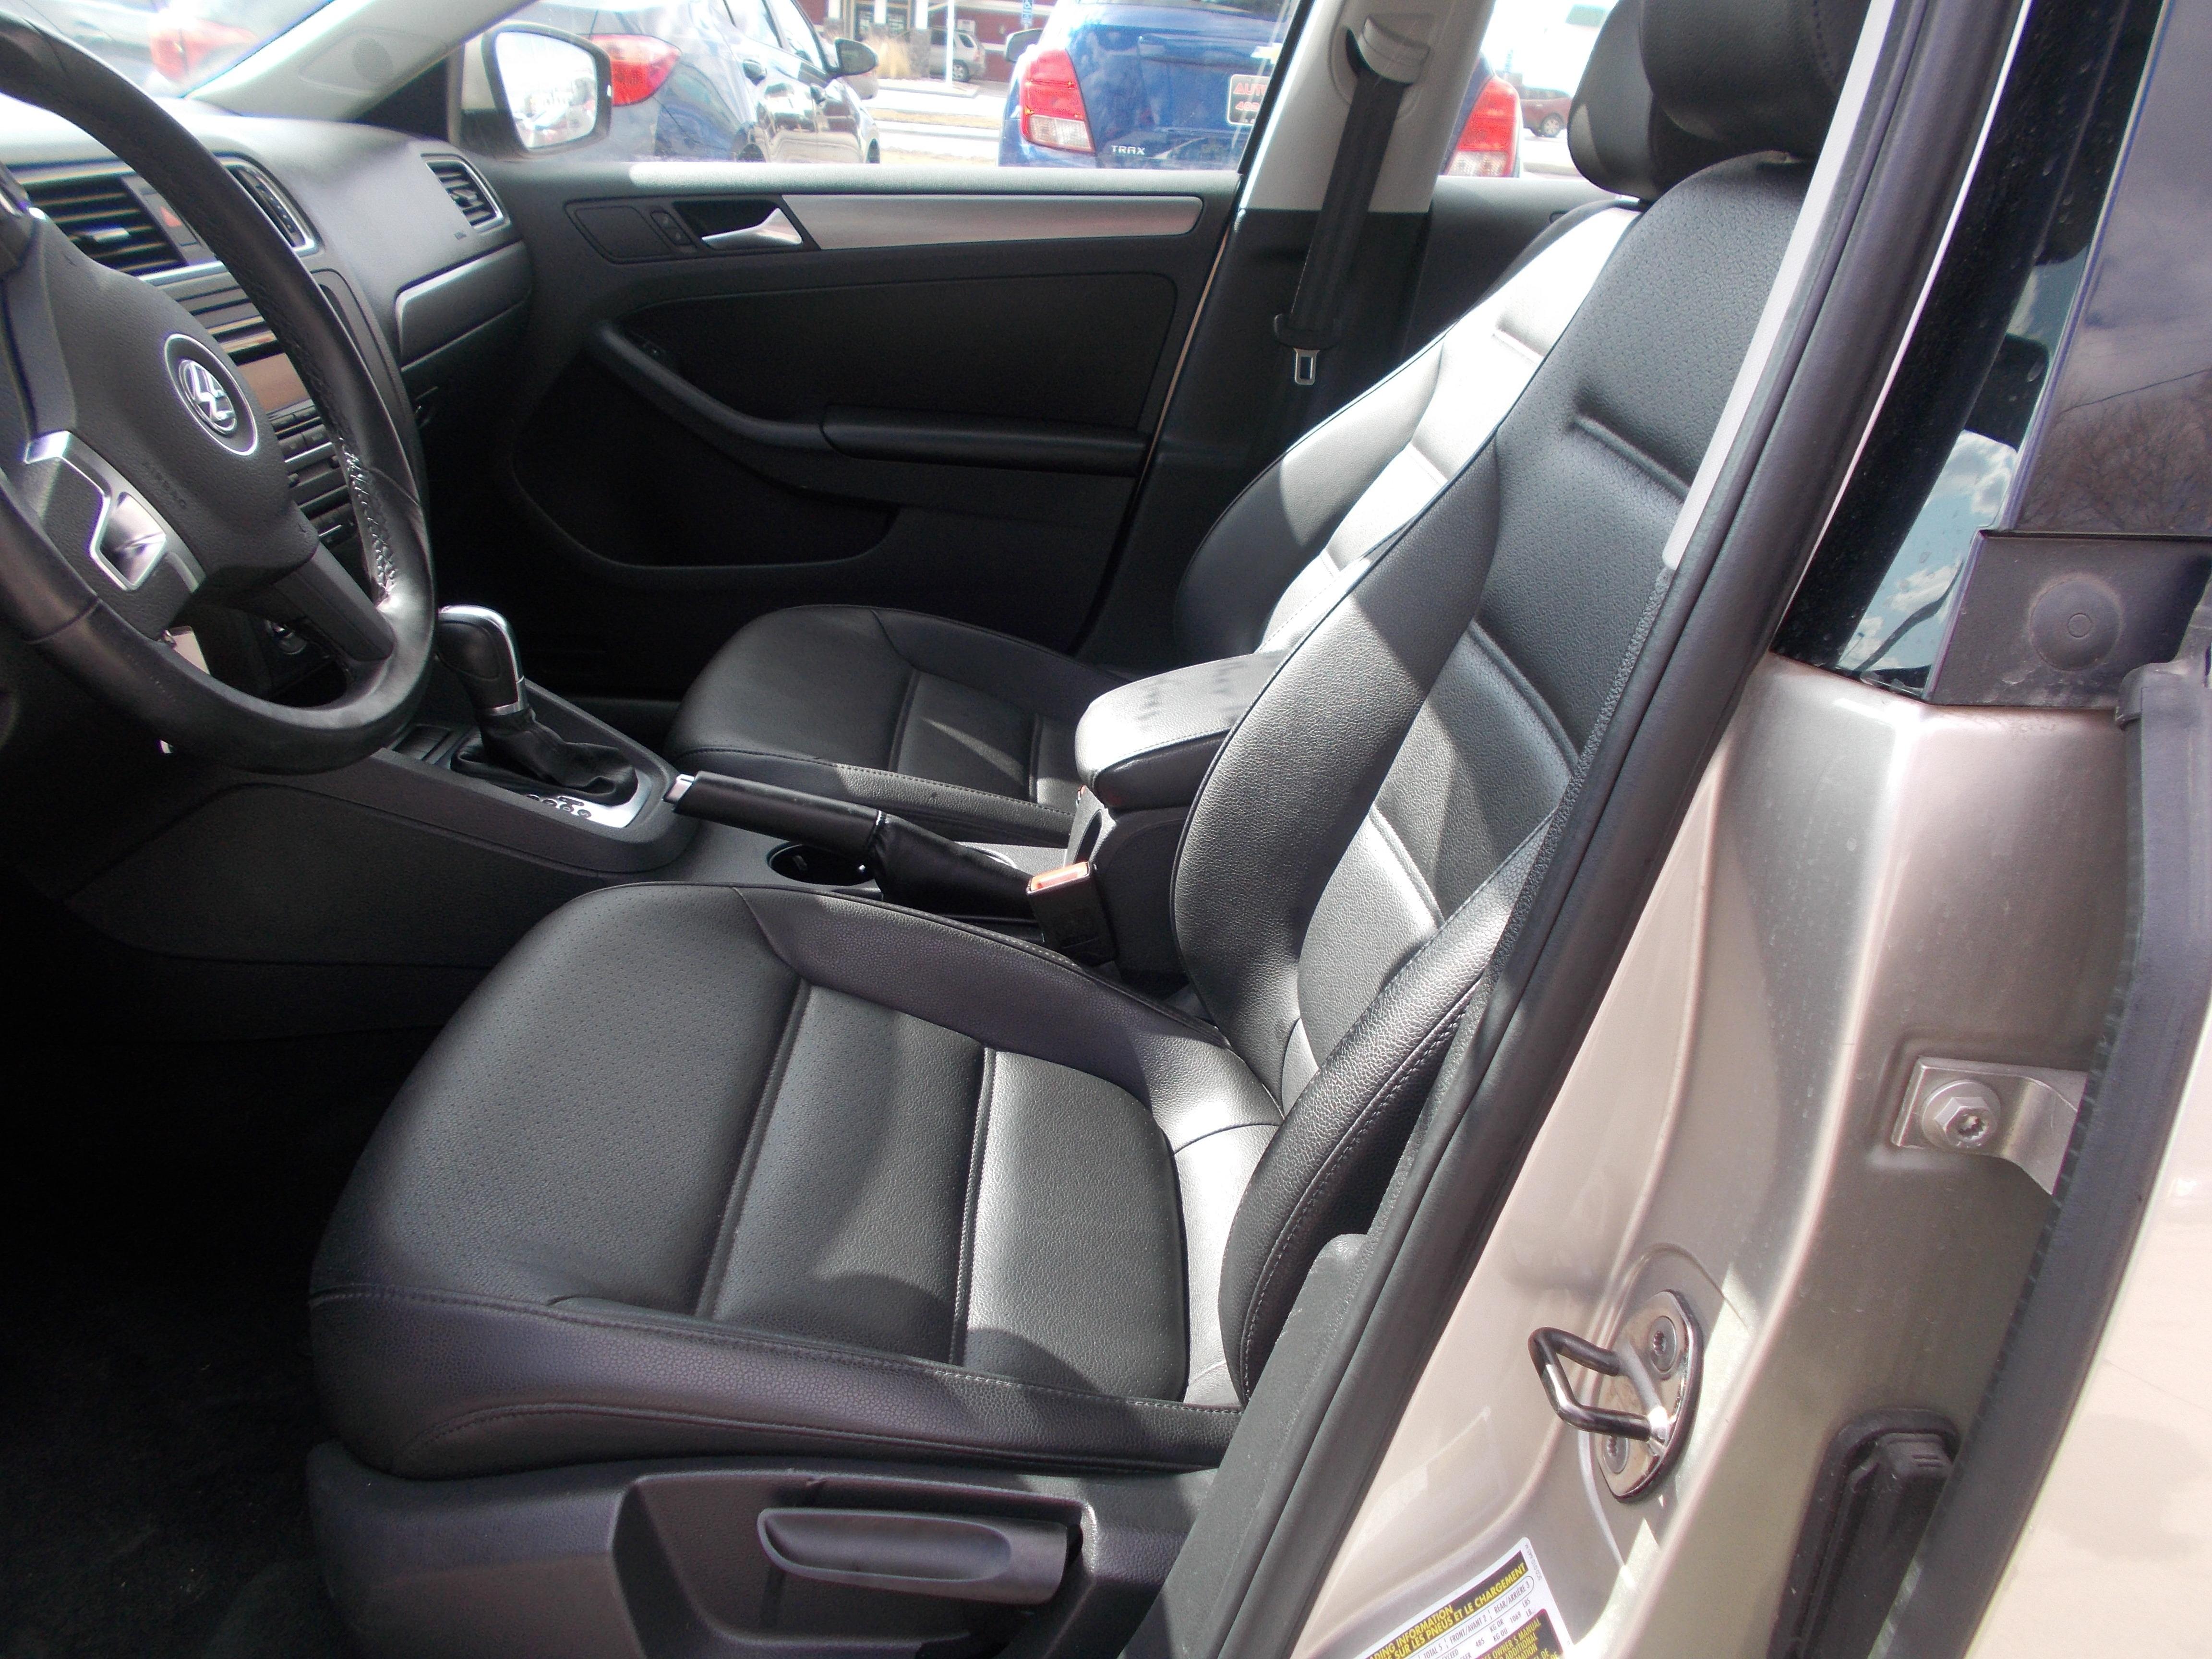 Dark Grey Dashboard Pad Dash Cover Mat For 1999 Later 2005 VW Jetta